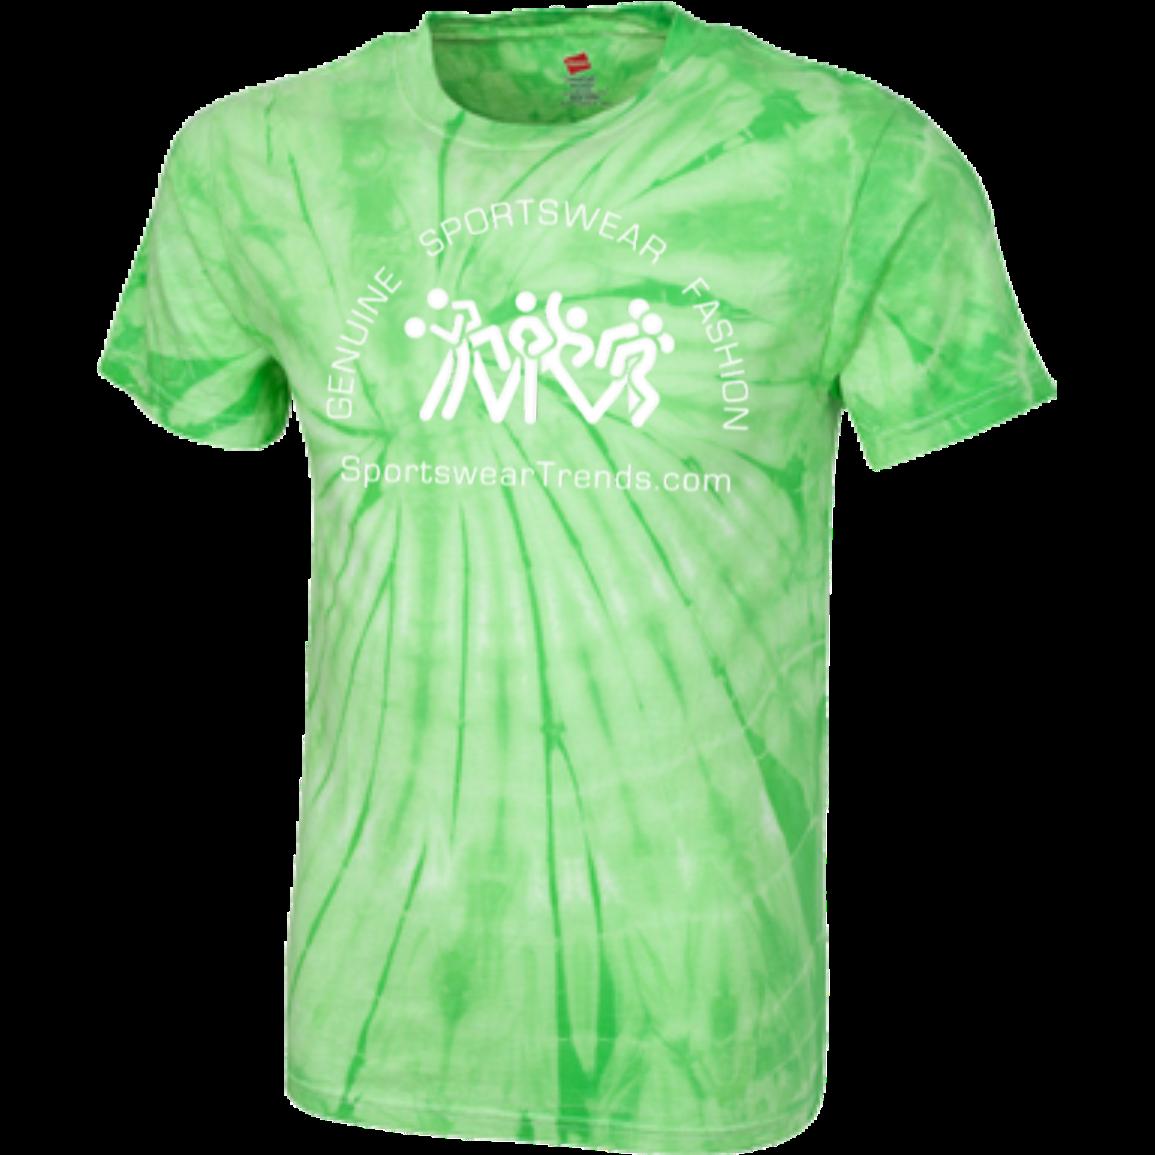 Customized 100% Cotton Tie Dye T-Shirt